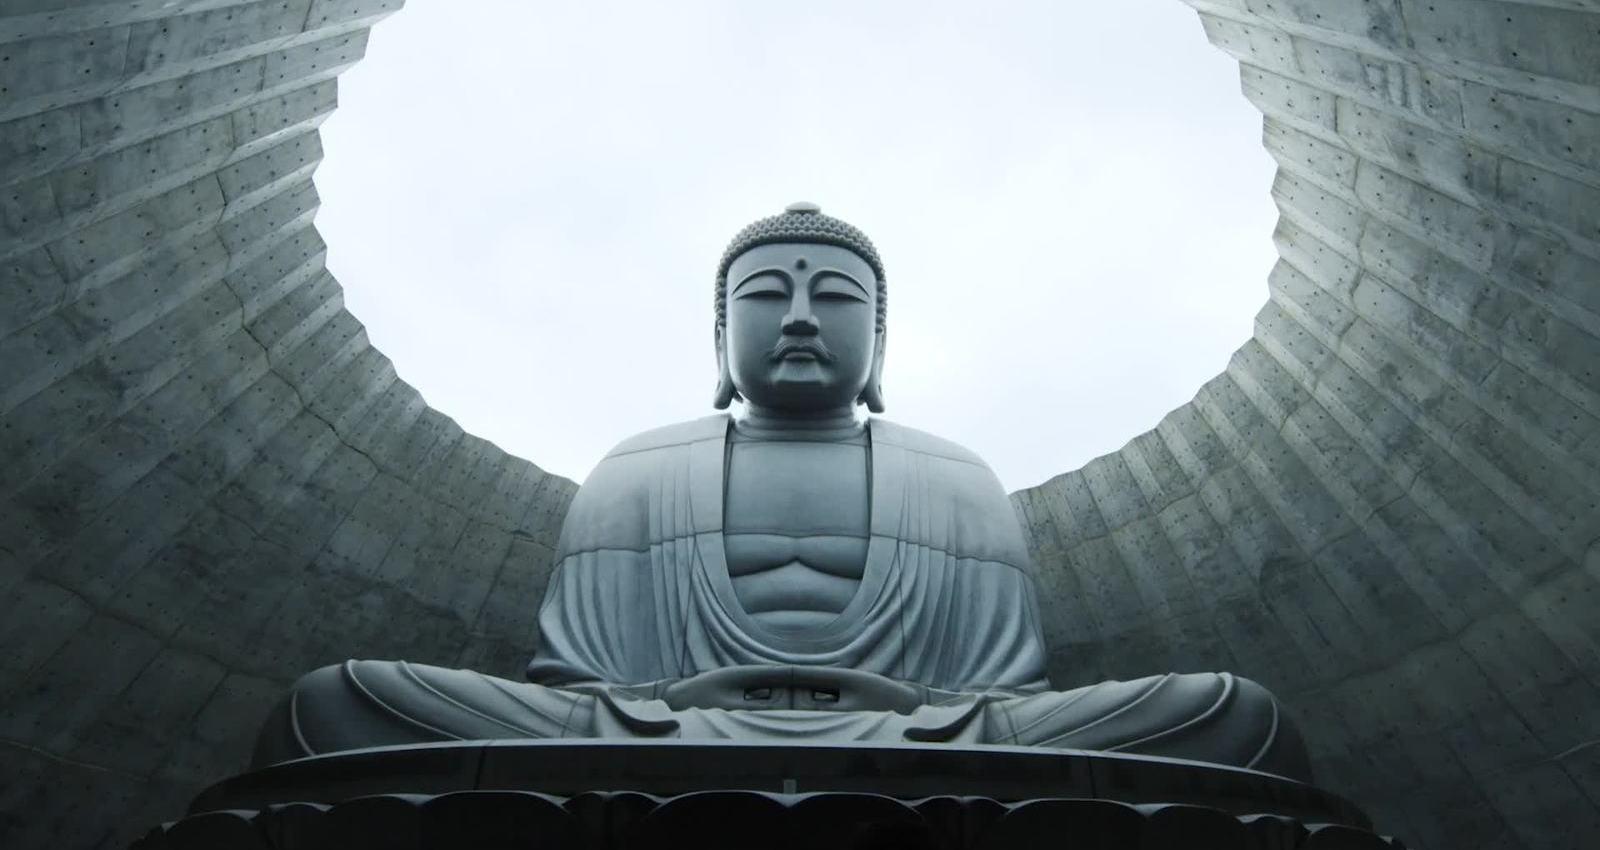 PRAY TO THE GREAT BUDDHA